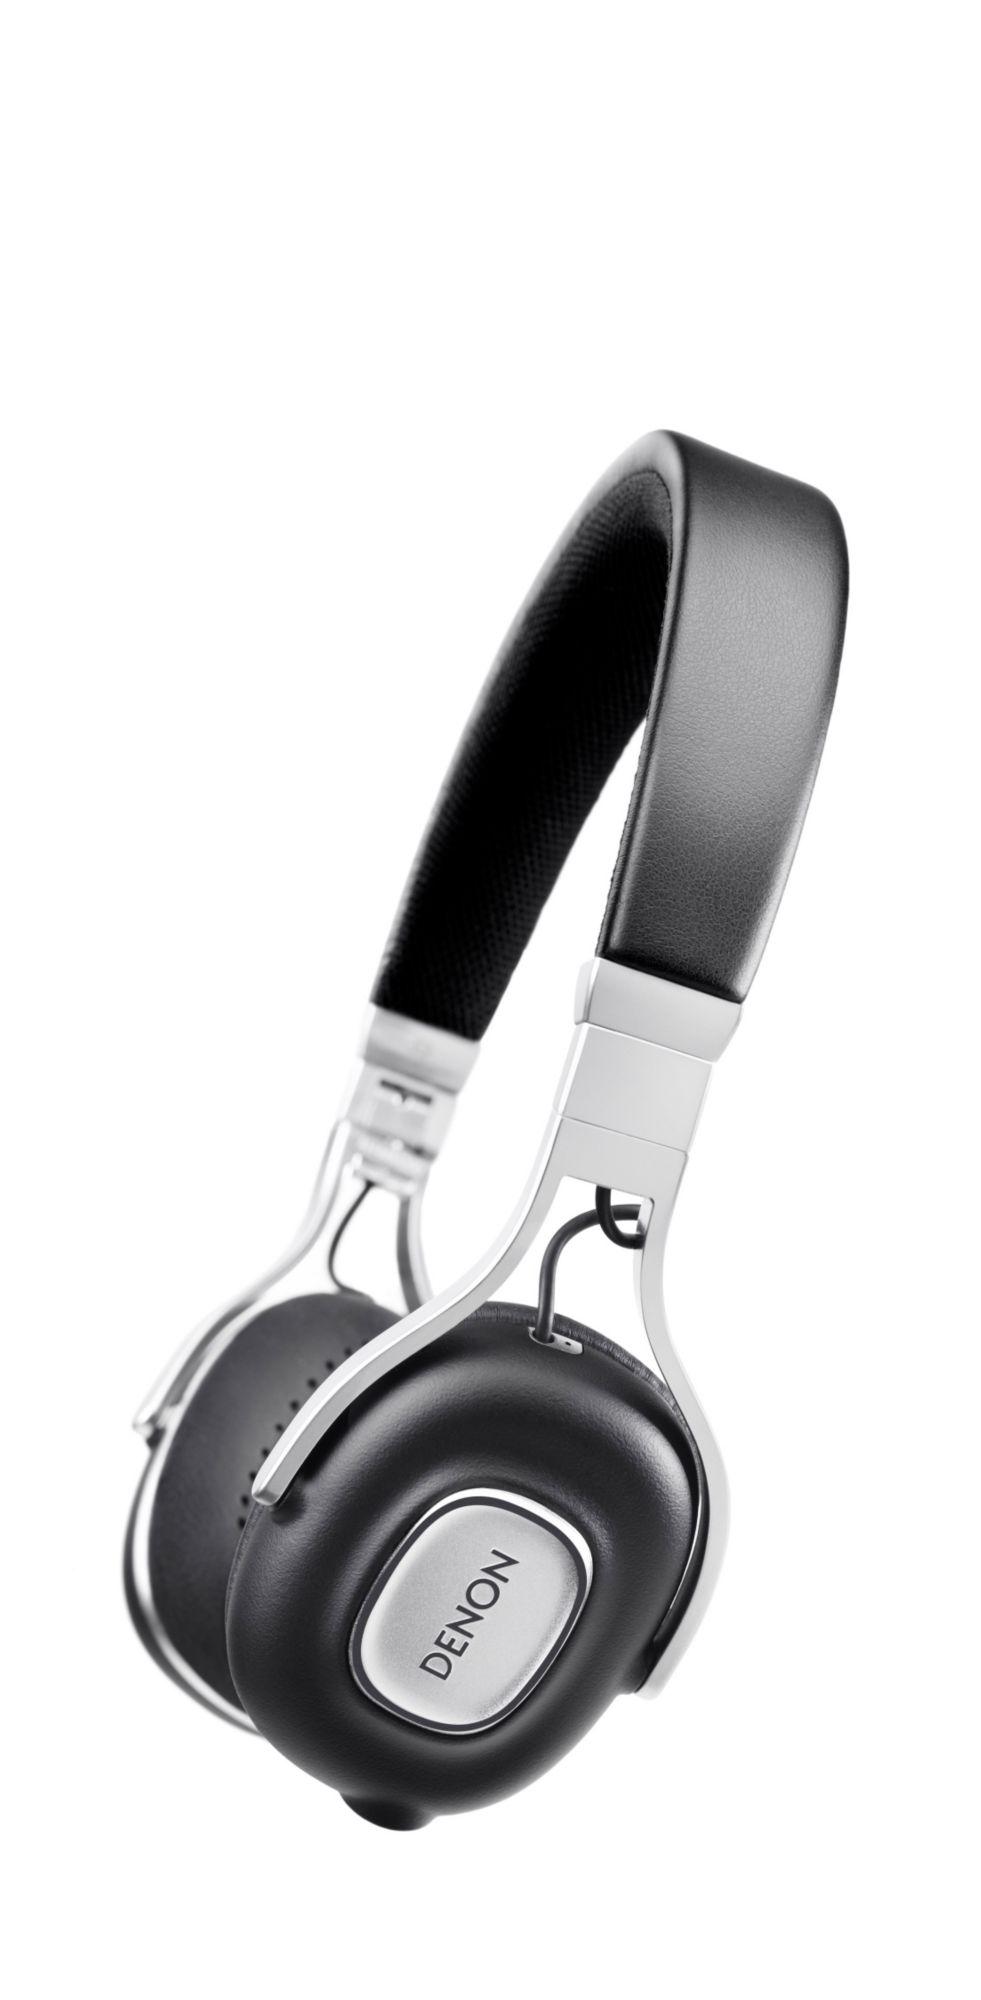 DENON Denon AH-MM200 On-Ear-Kopfhörer, Mikrofon &  Fernbedienung, Schwarz